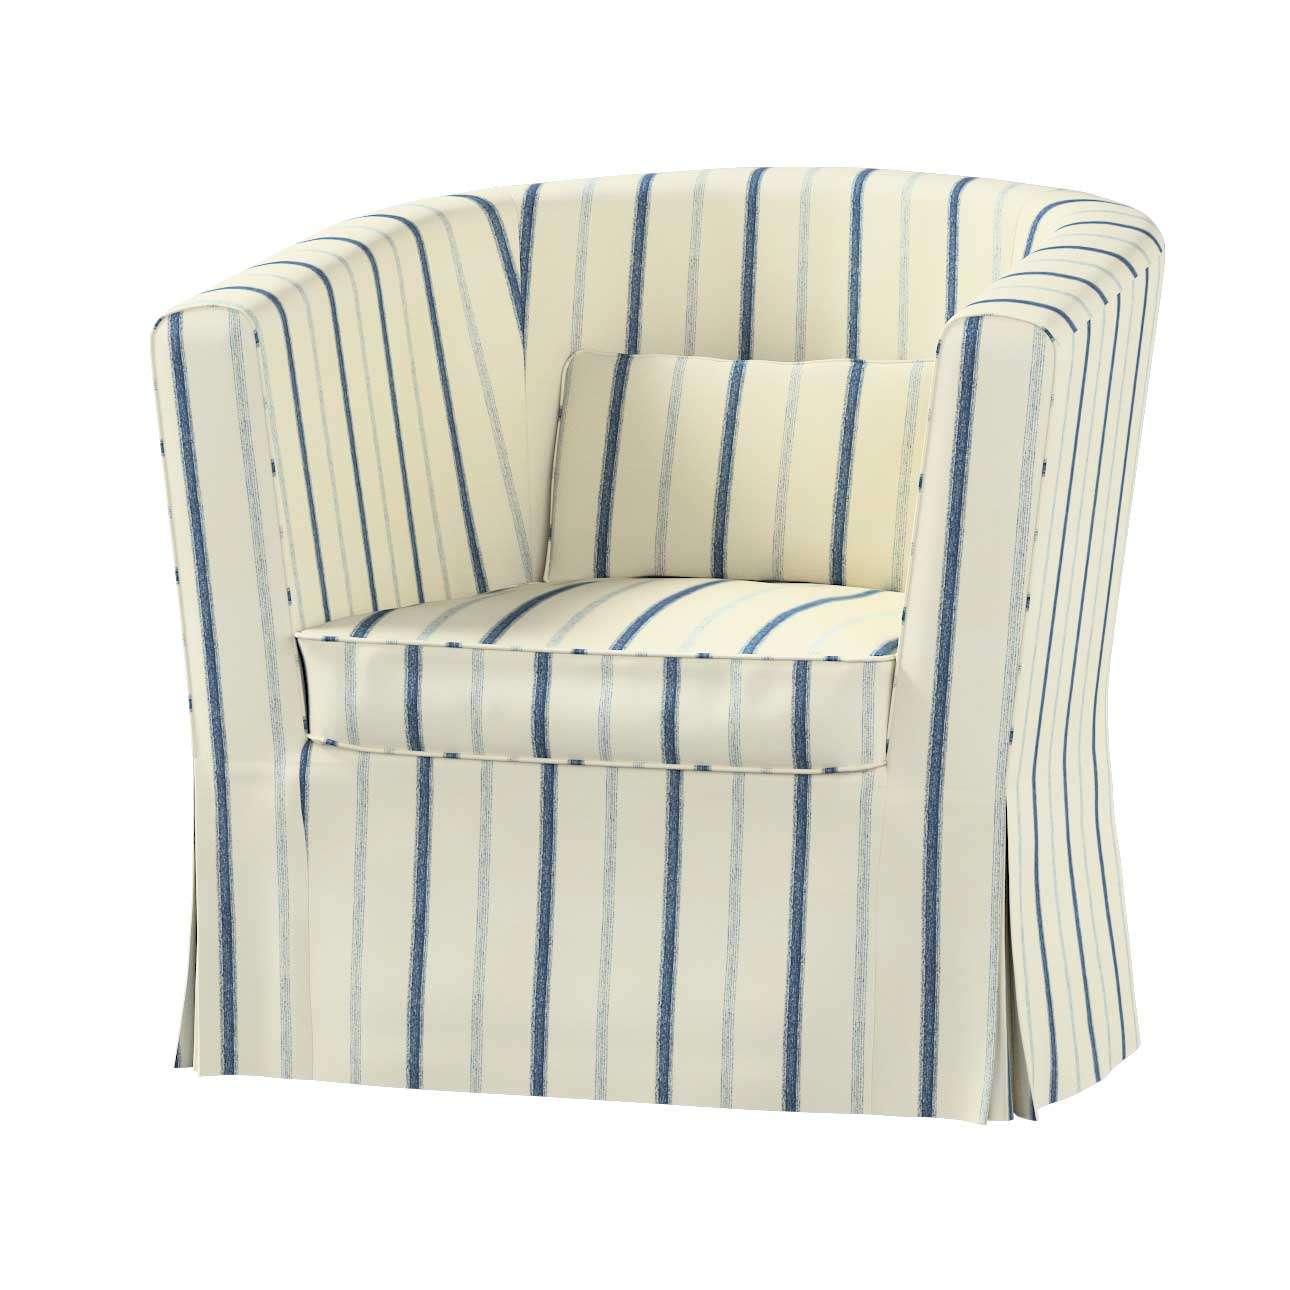 Ektorp Tullsta chair cover Ektorp Tullsta armchair cover in collection Avinon fabric 129-  sc 1 st  Dekoria & Ektorp Tullsta chair cover blue stripes ivory background Ektorp ...